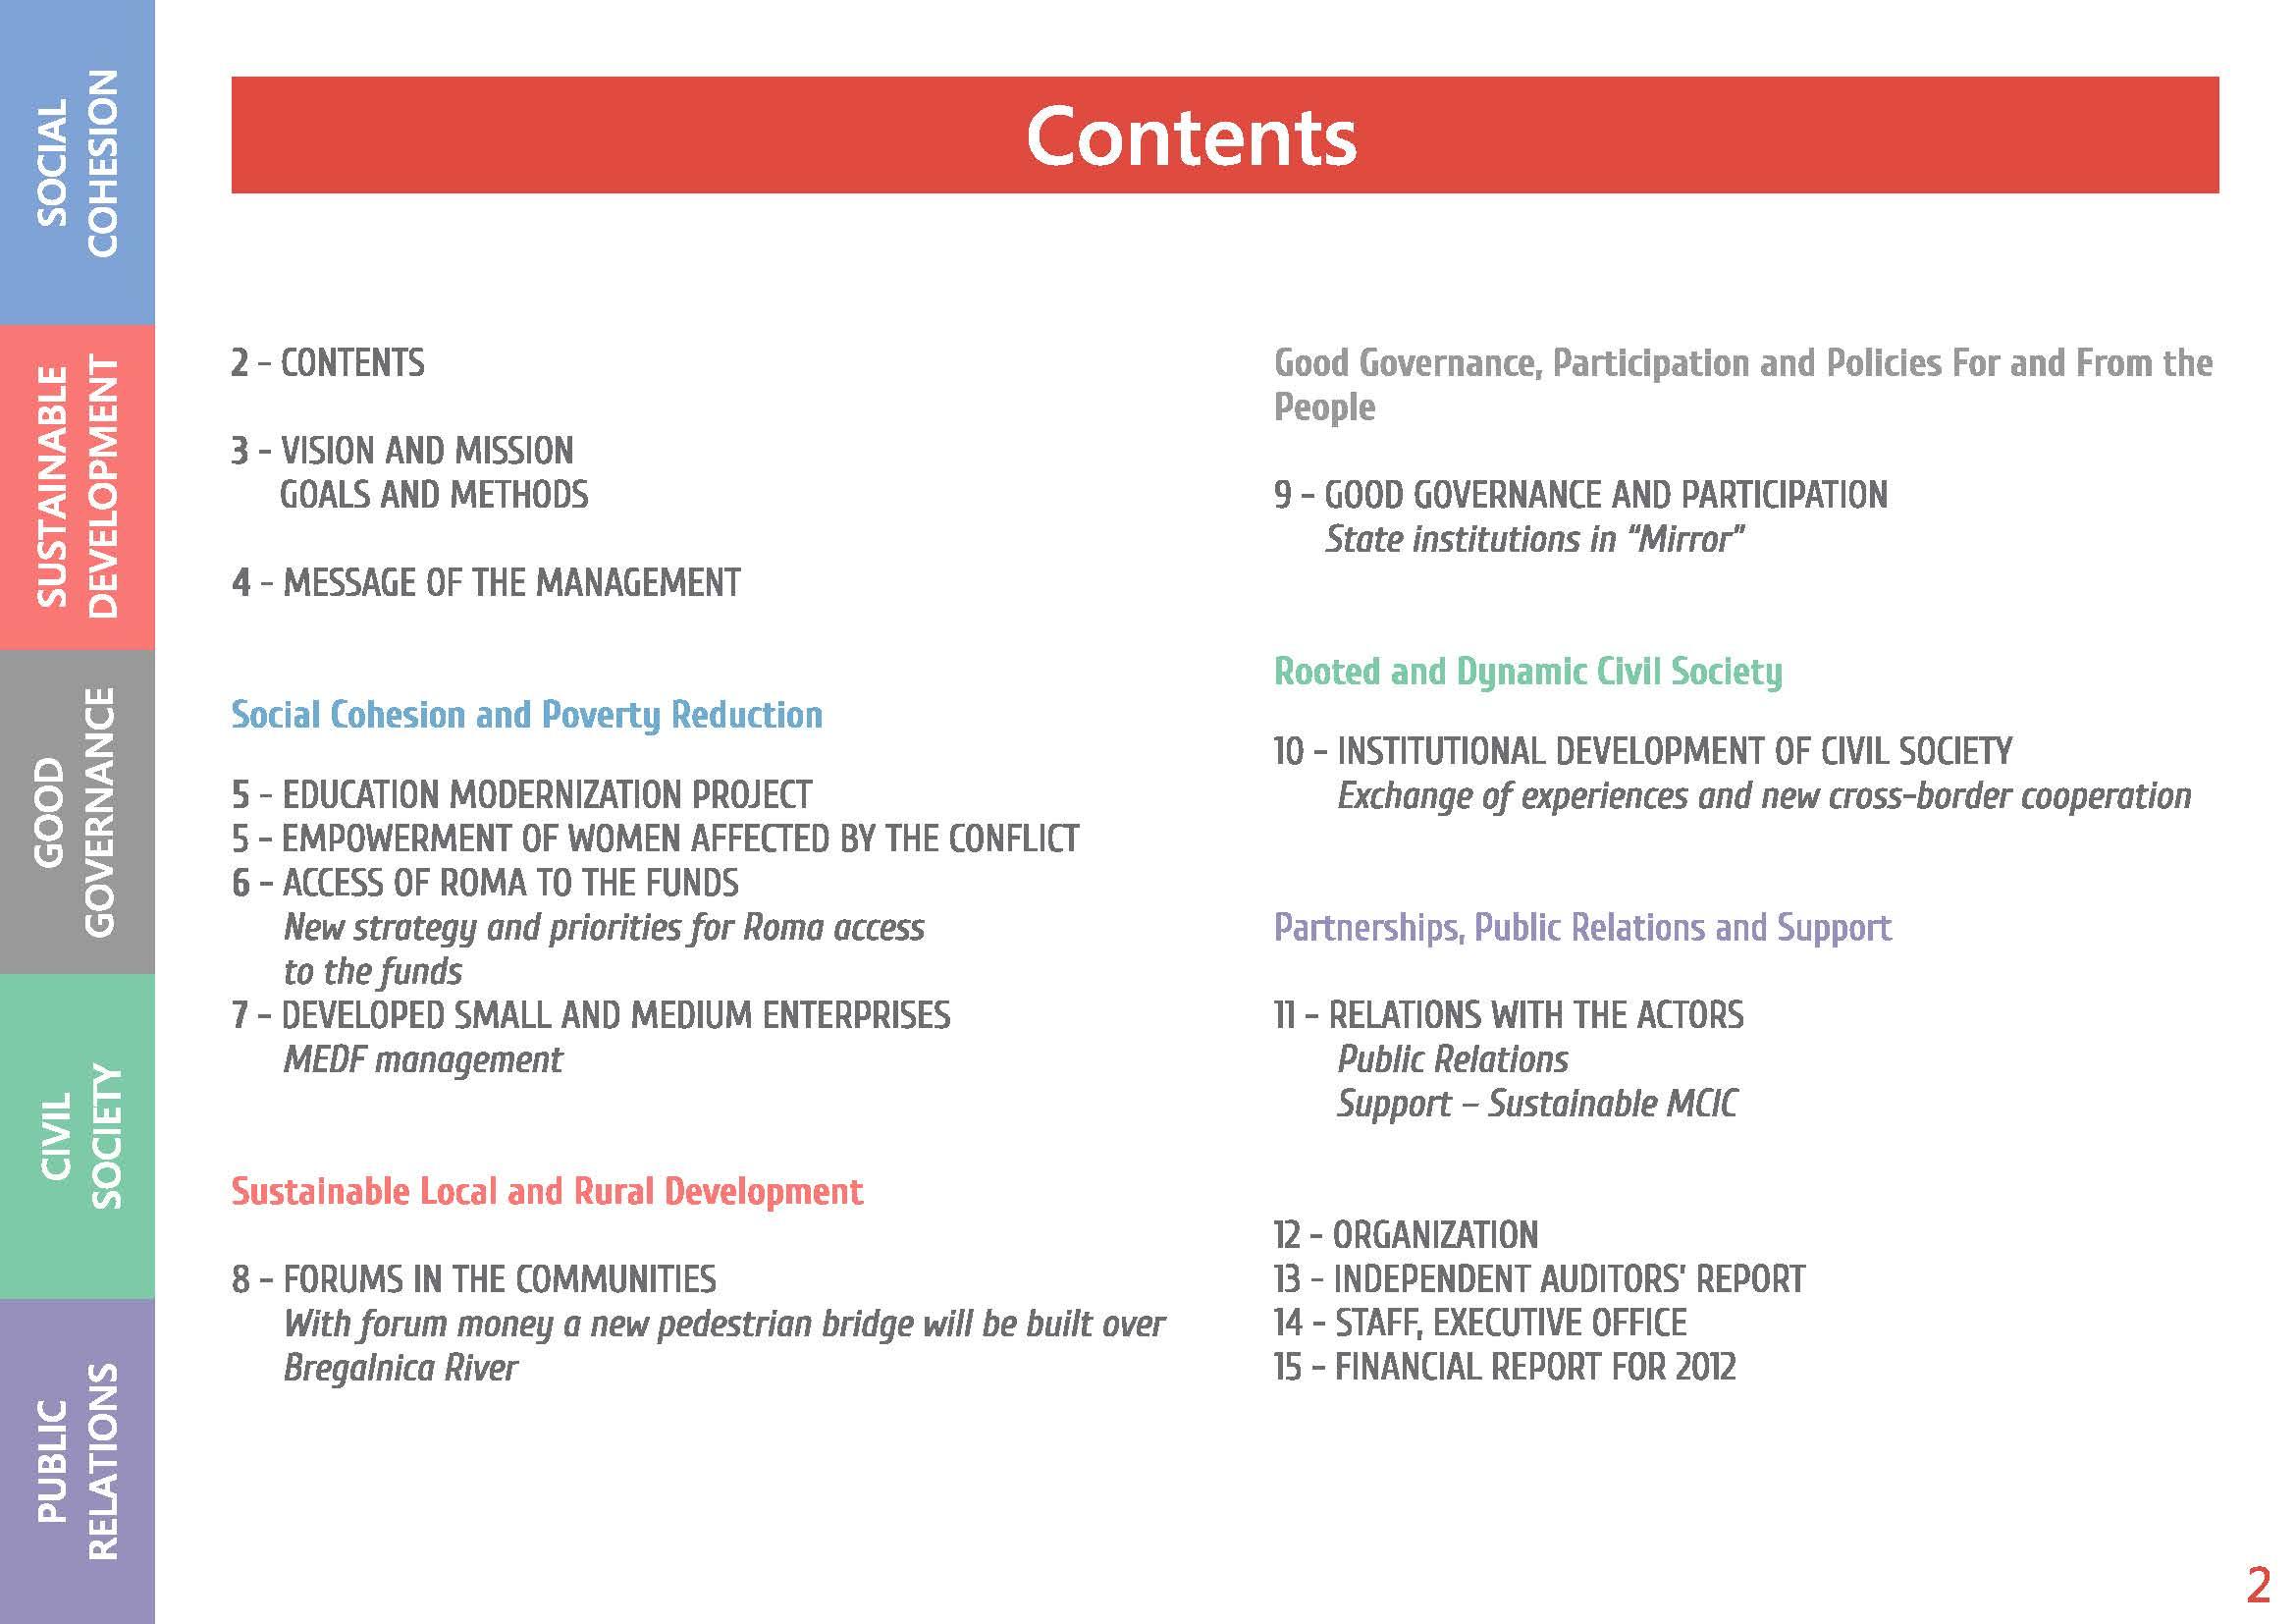 MCIC 2009 Report_Seite_02.jpg